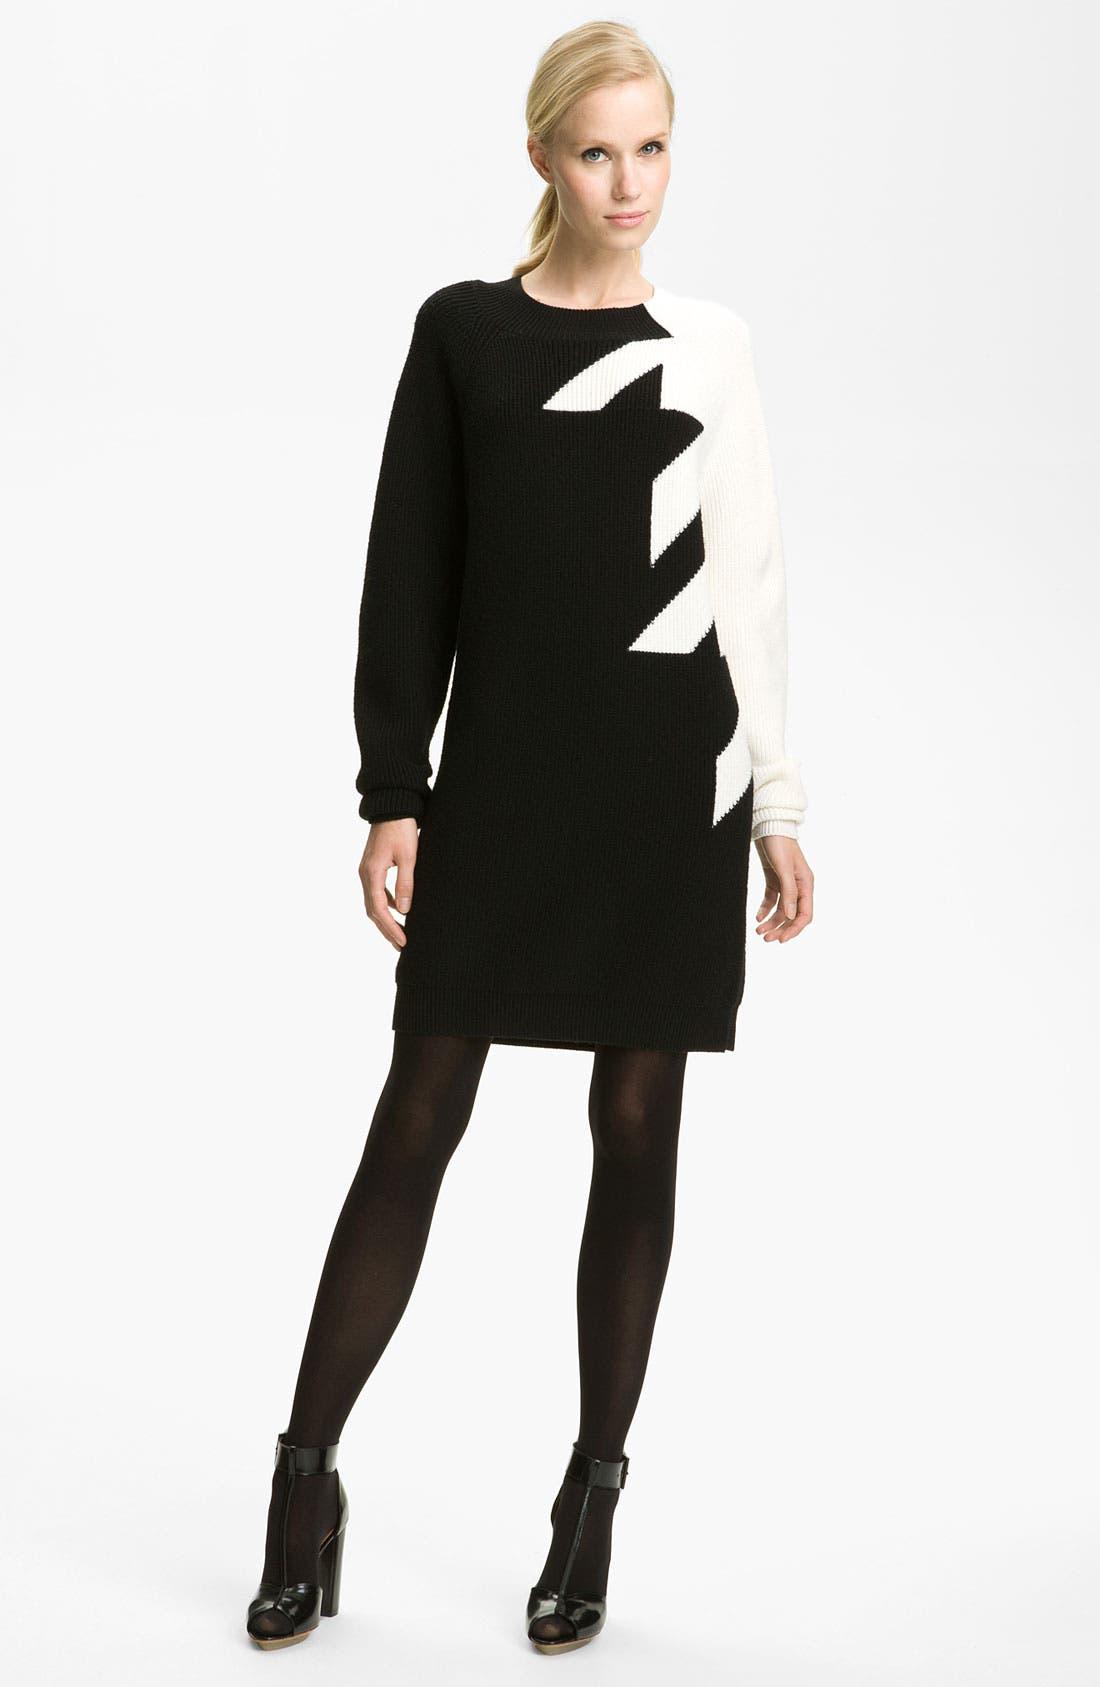 Alternate Image 1 Selected - 3.1 Phillip Lim Houndstooth Knit Dress